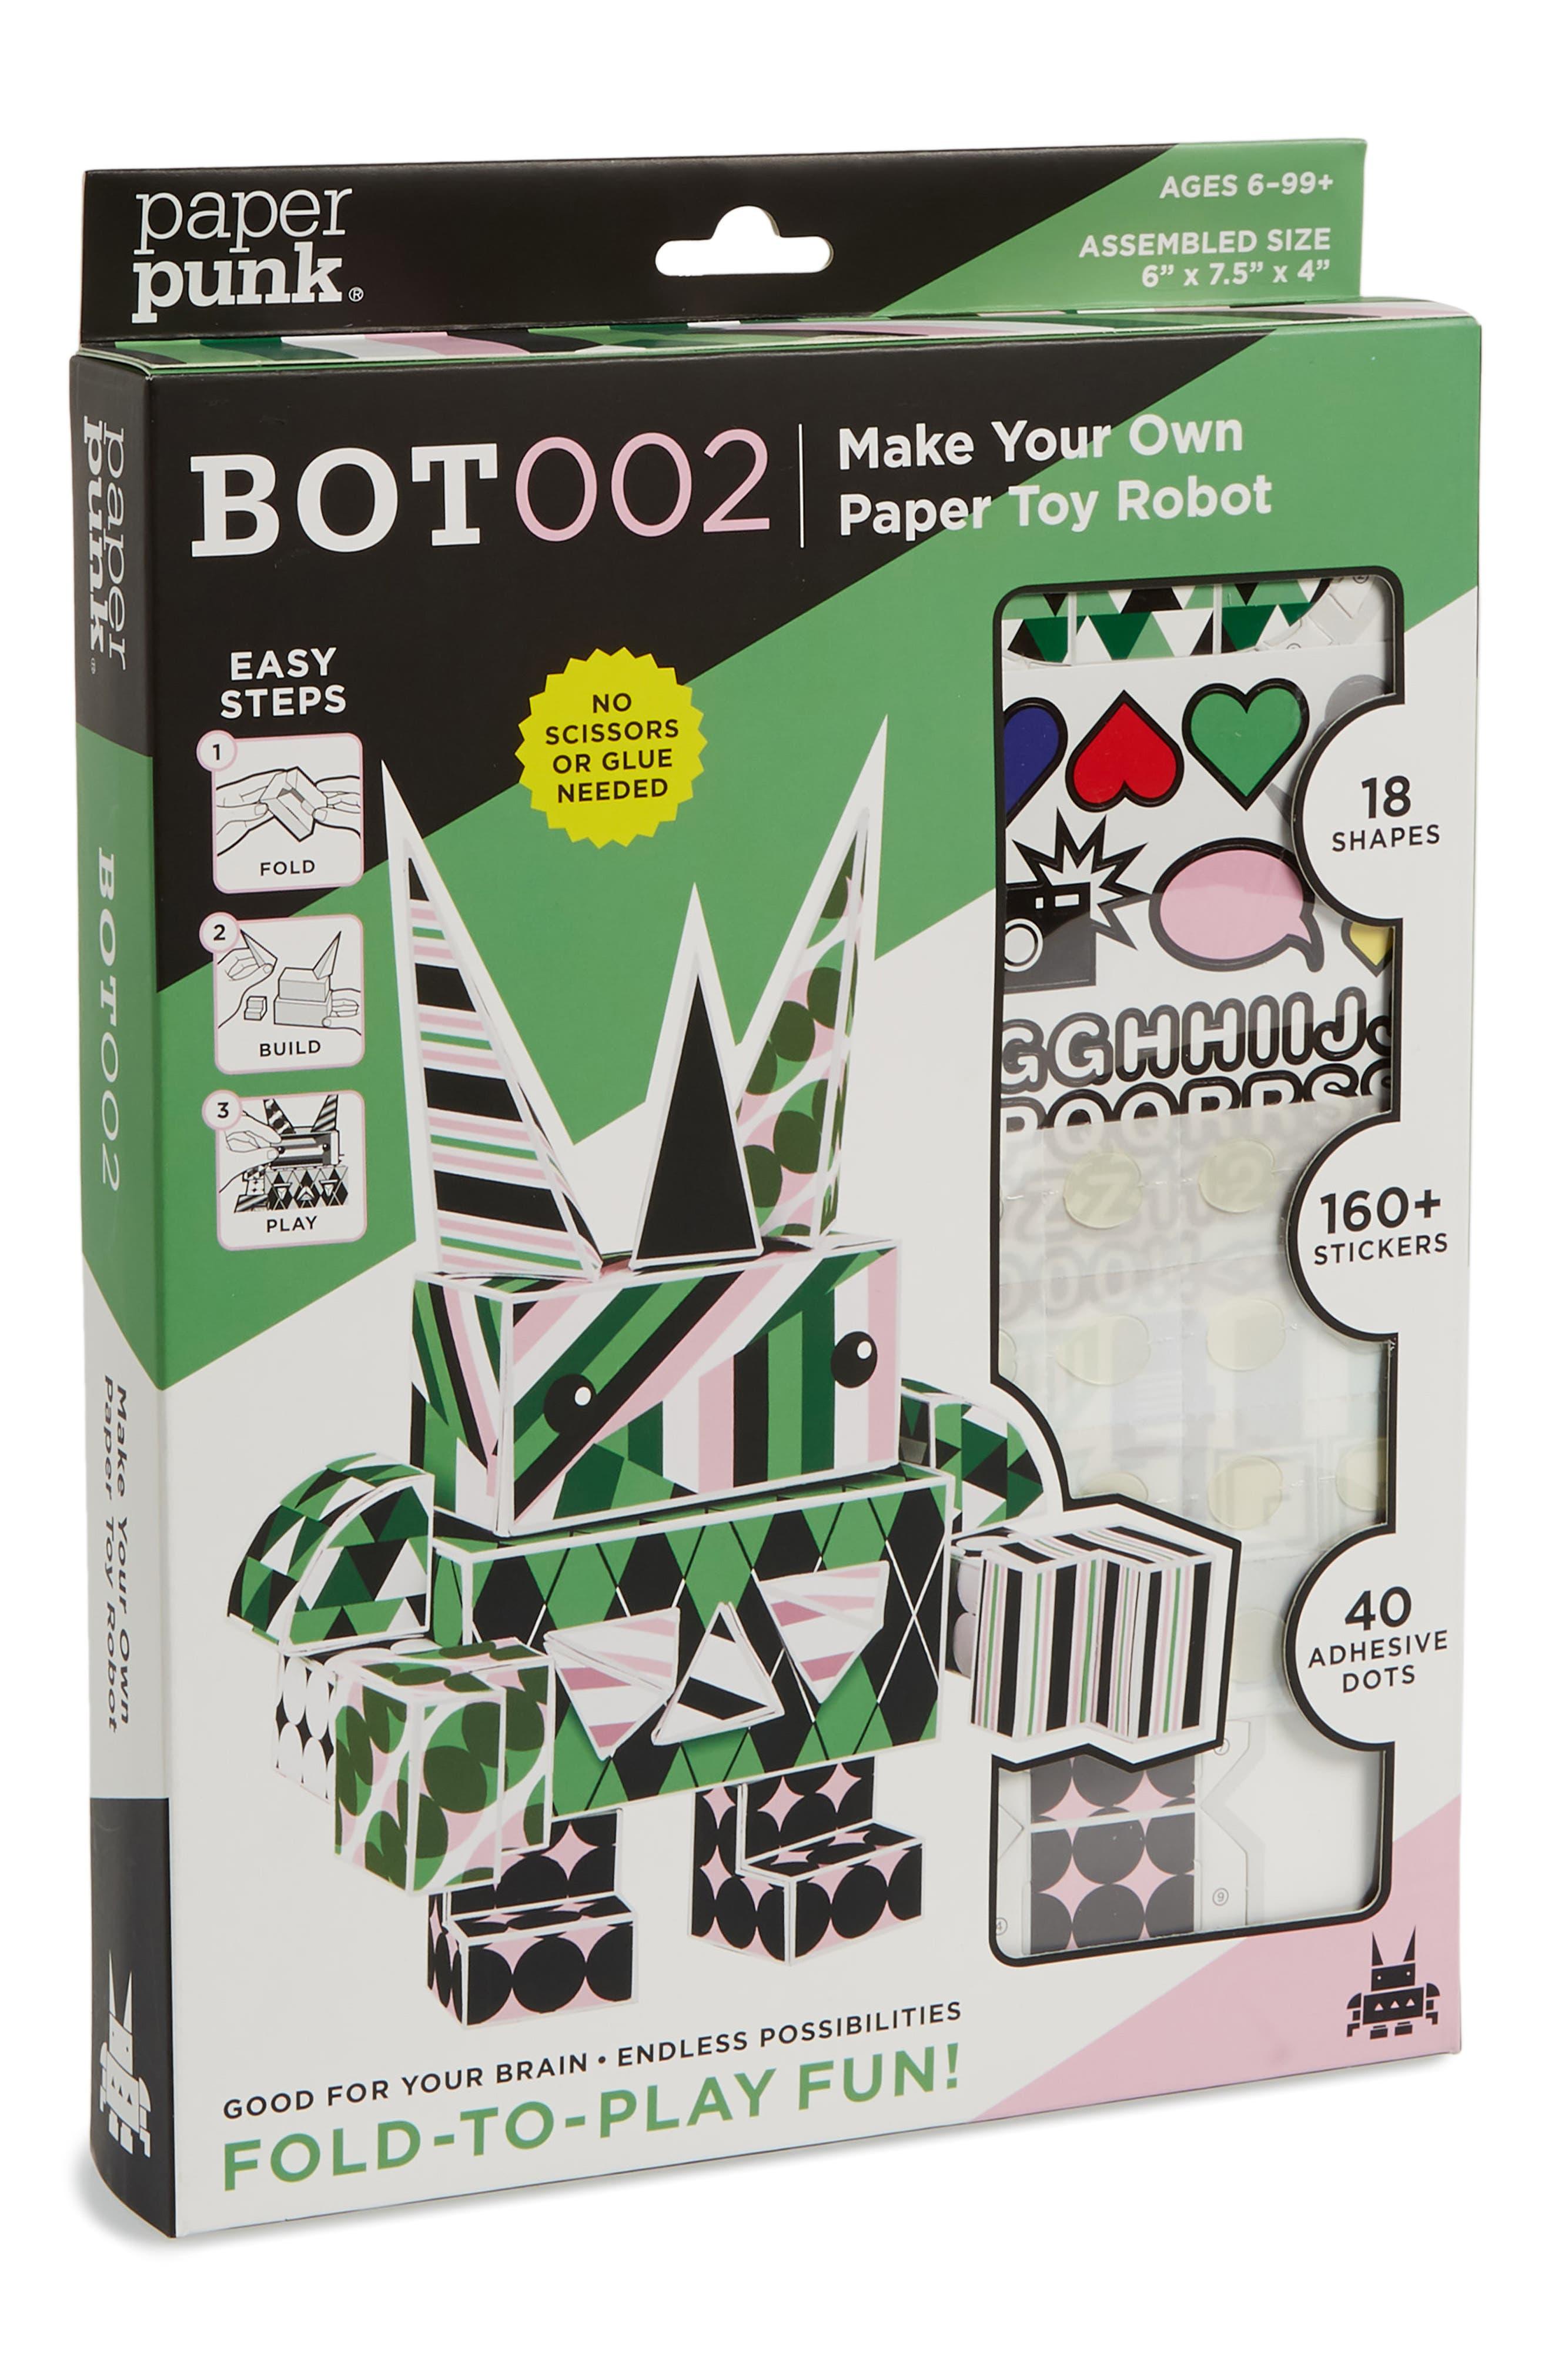 Bot002 Make Your Own Paper Toy Robot Kit,                             Main thumbnail 1, color,                             Multi